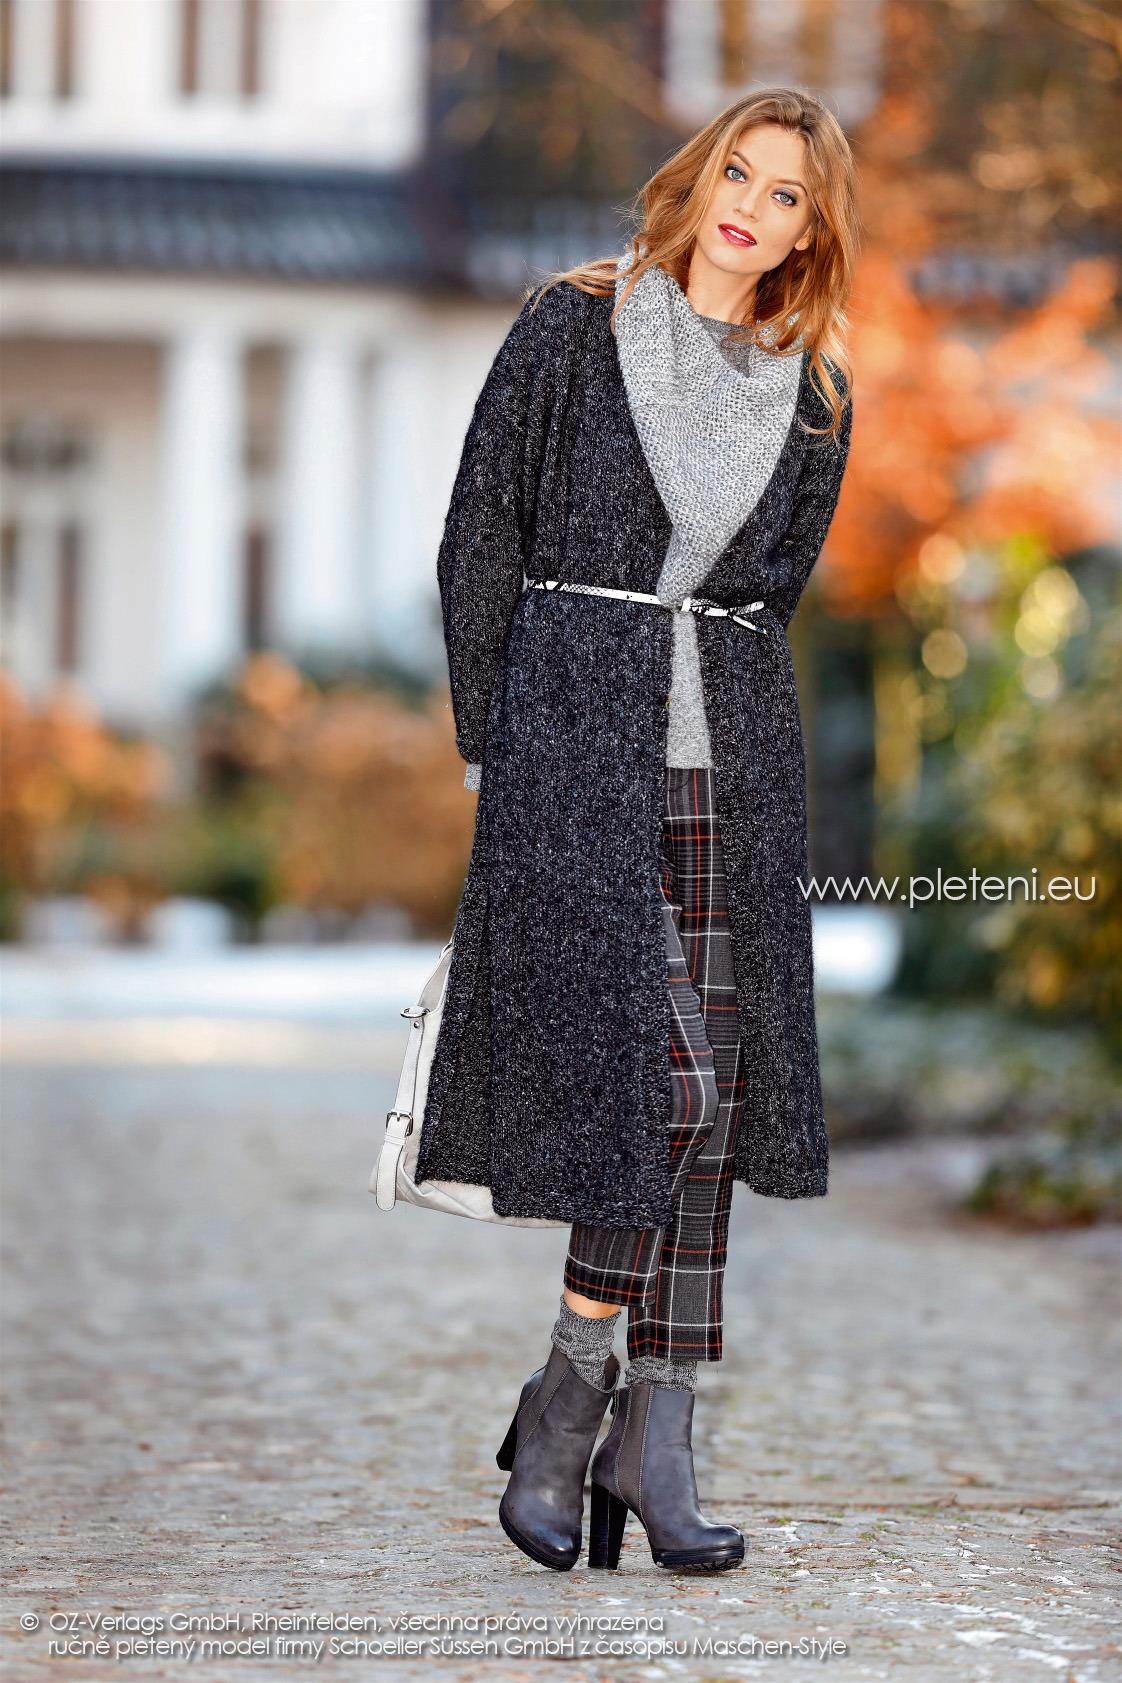 2017-2018 model 08 dámský pletený kabát z příze Alpaca Tweed firmy Schoeller